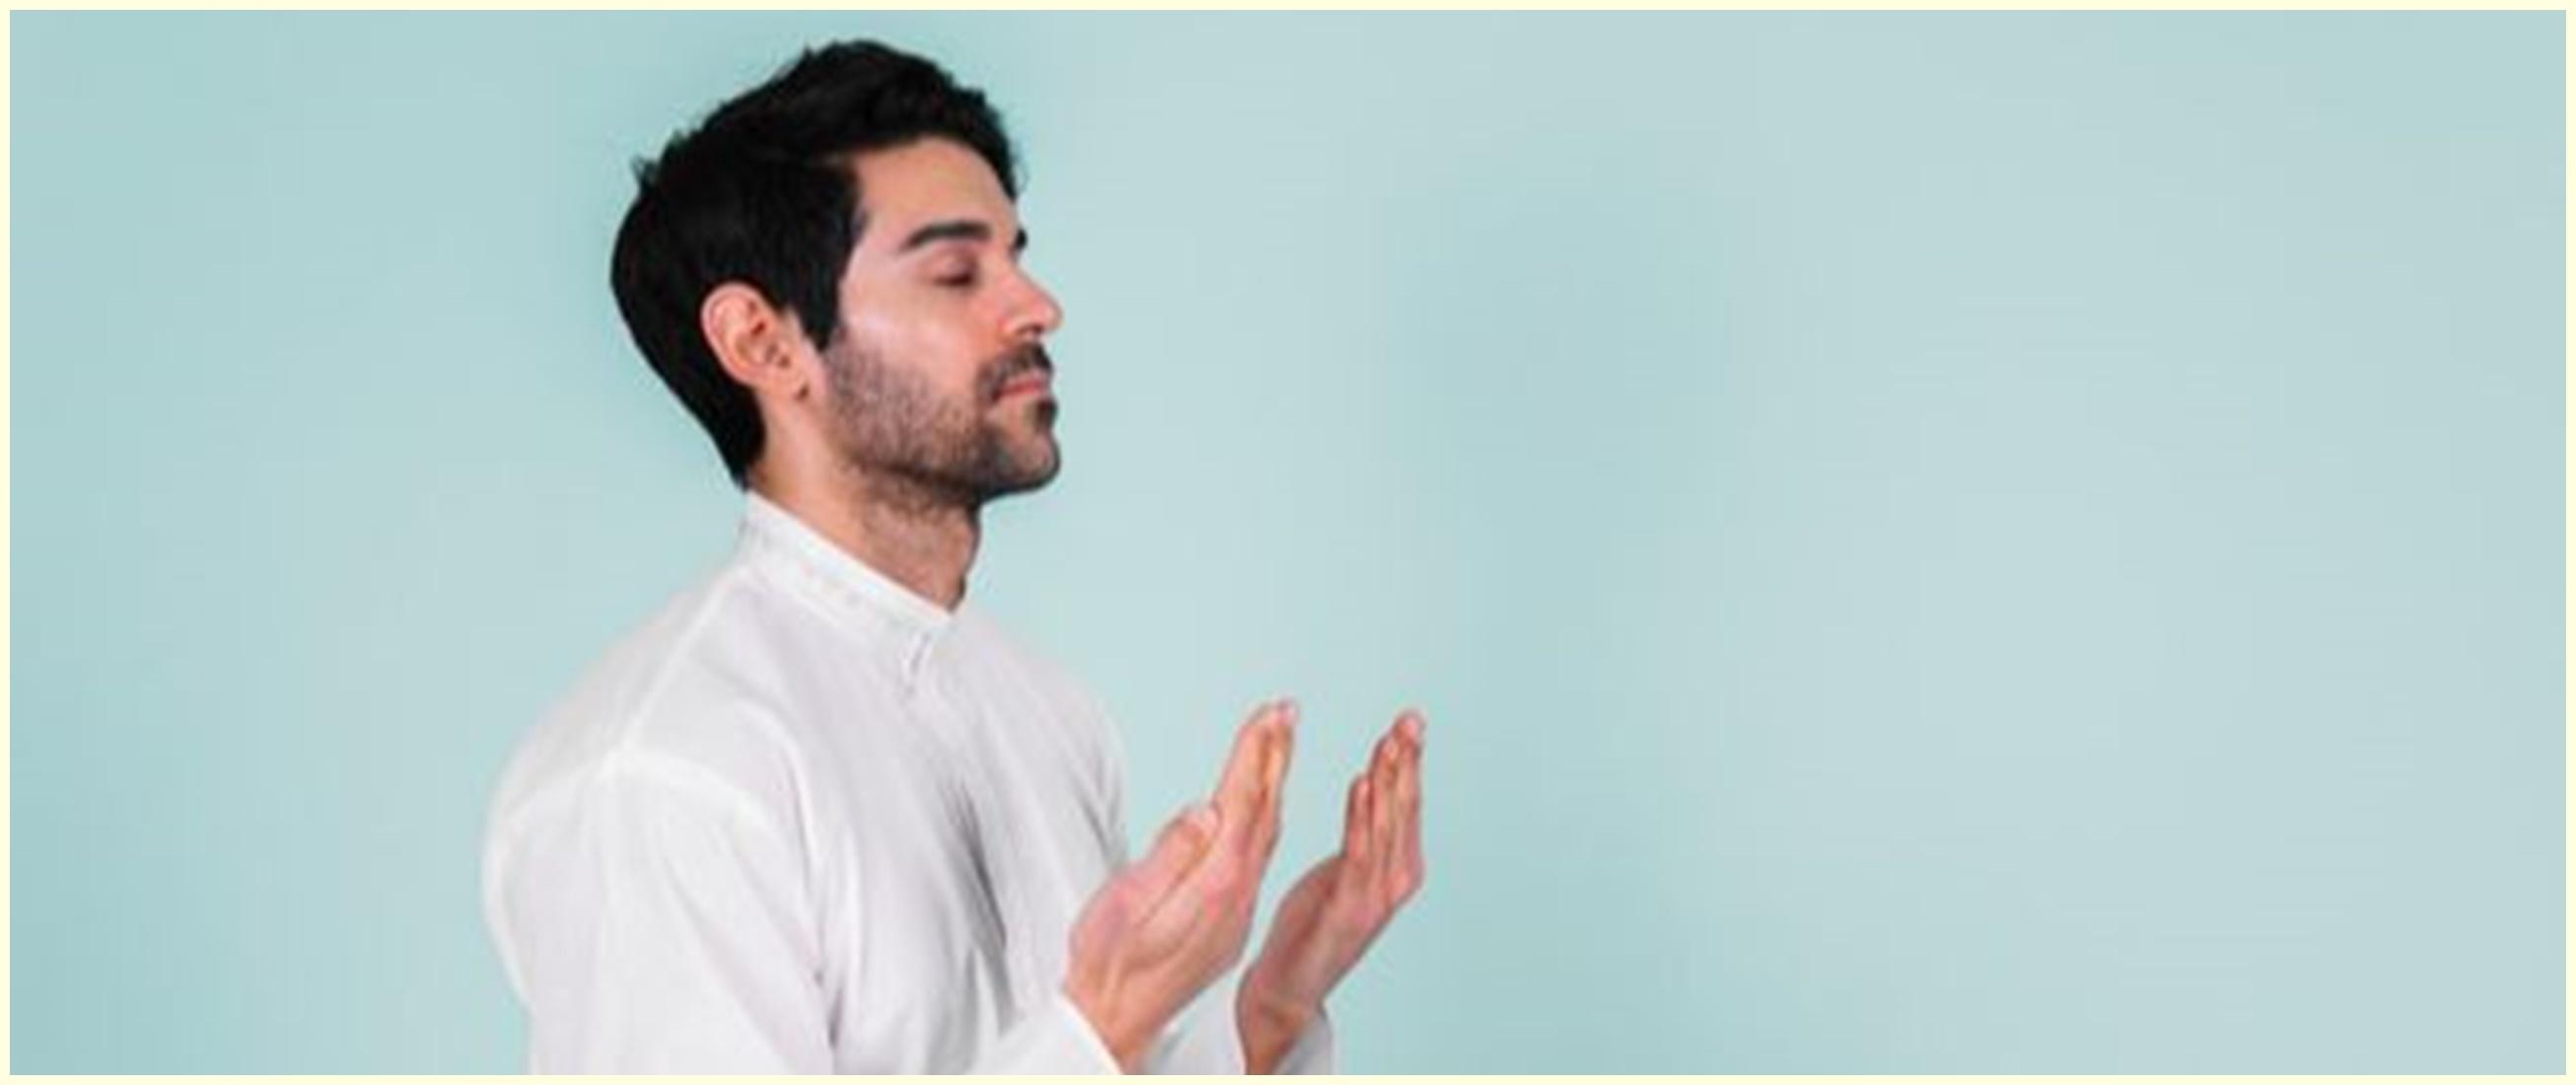 Doa menahan hawa nafsu syahwat menurut anjuran Rasulullah